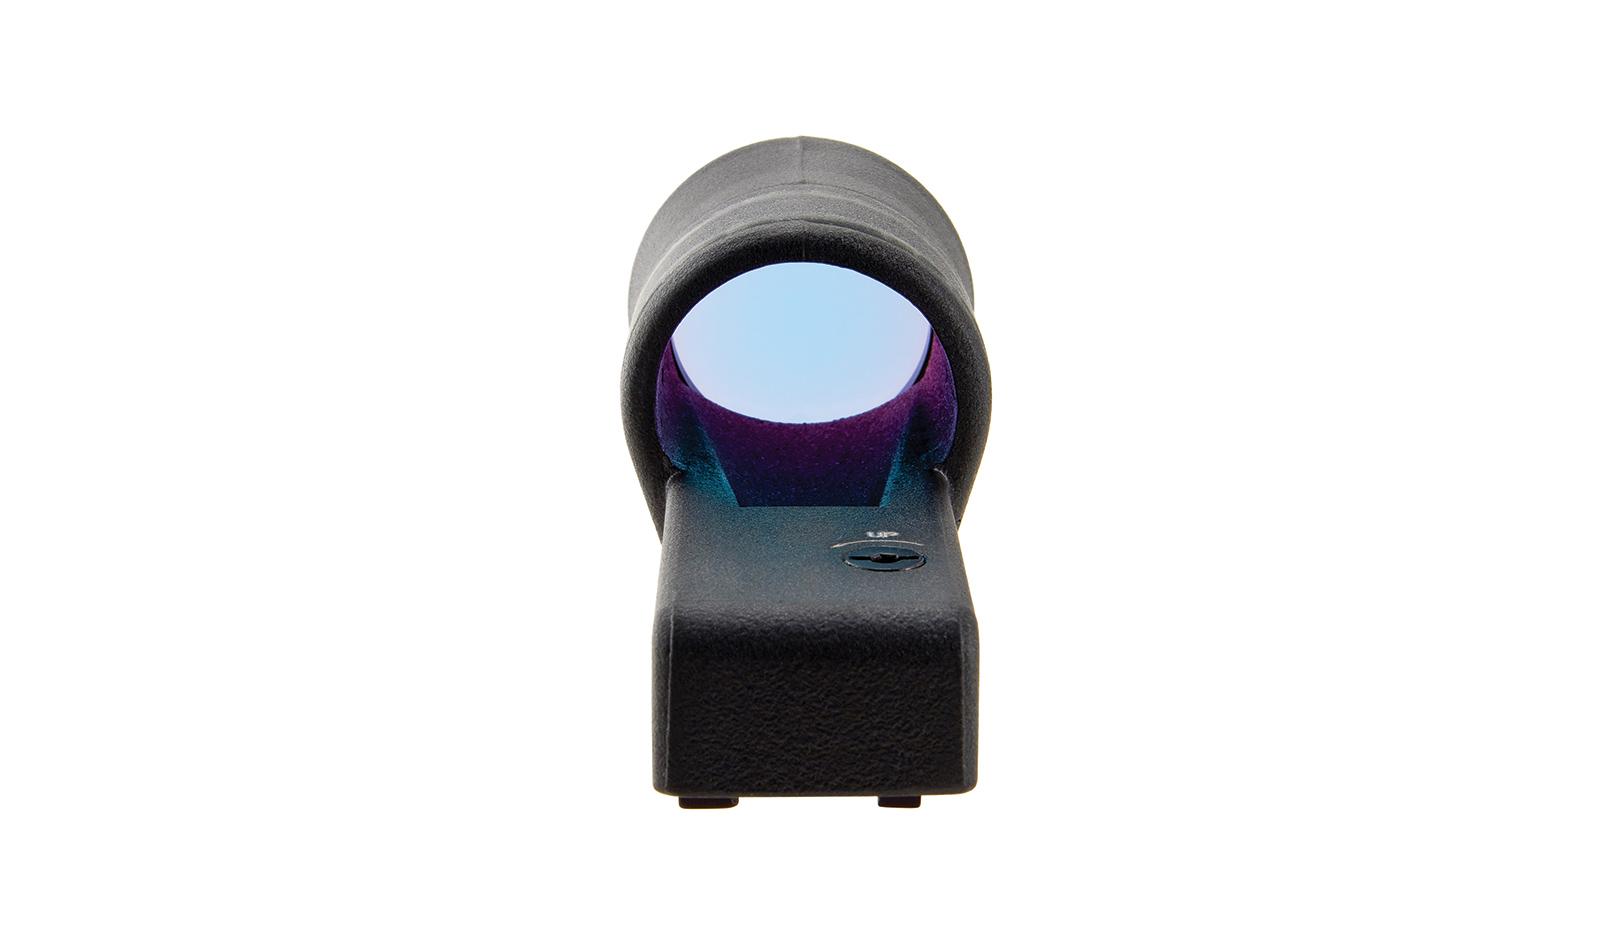 RX30-14 angle 4